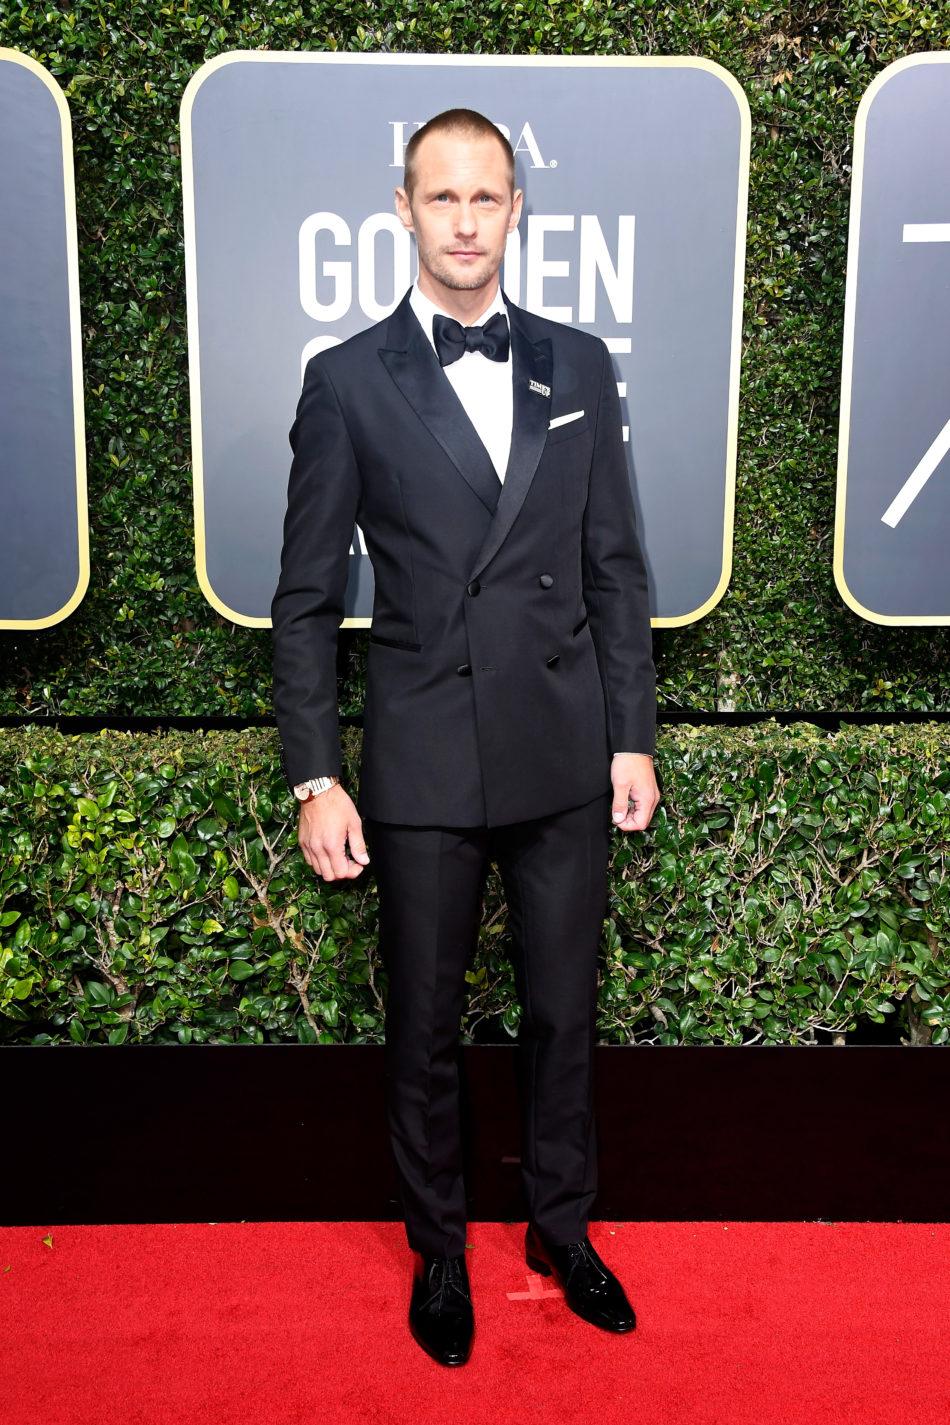 Golden Globes 2018, Red Carpet, Alfombra Roja, Tuxedos, Trajes, Ternos, Hombres, Looks, Outfits, Premiación, Masculinos, Estilismos, Vestir bien, Alexander Skarsgard